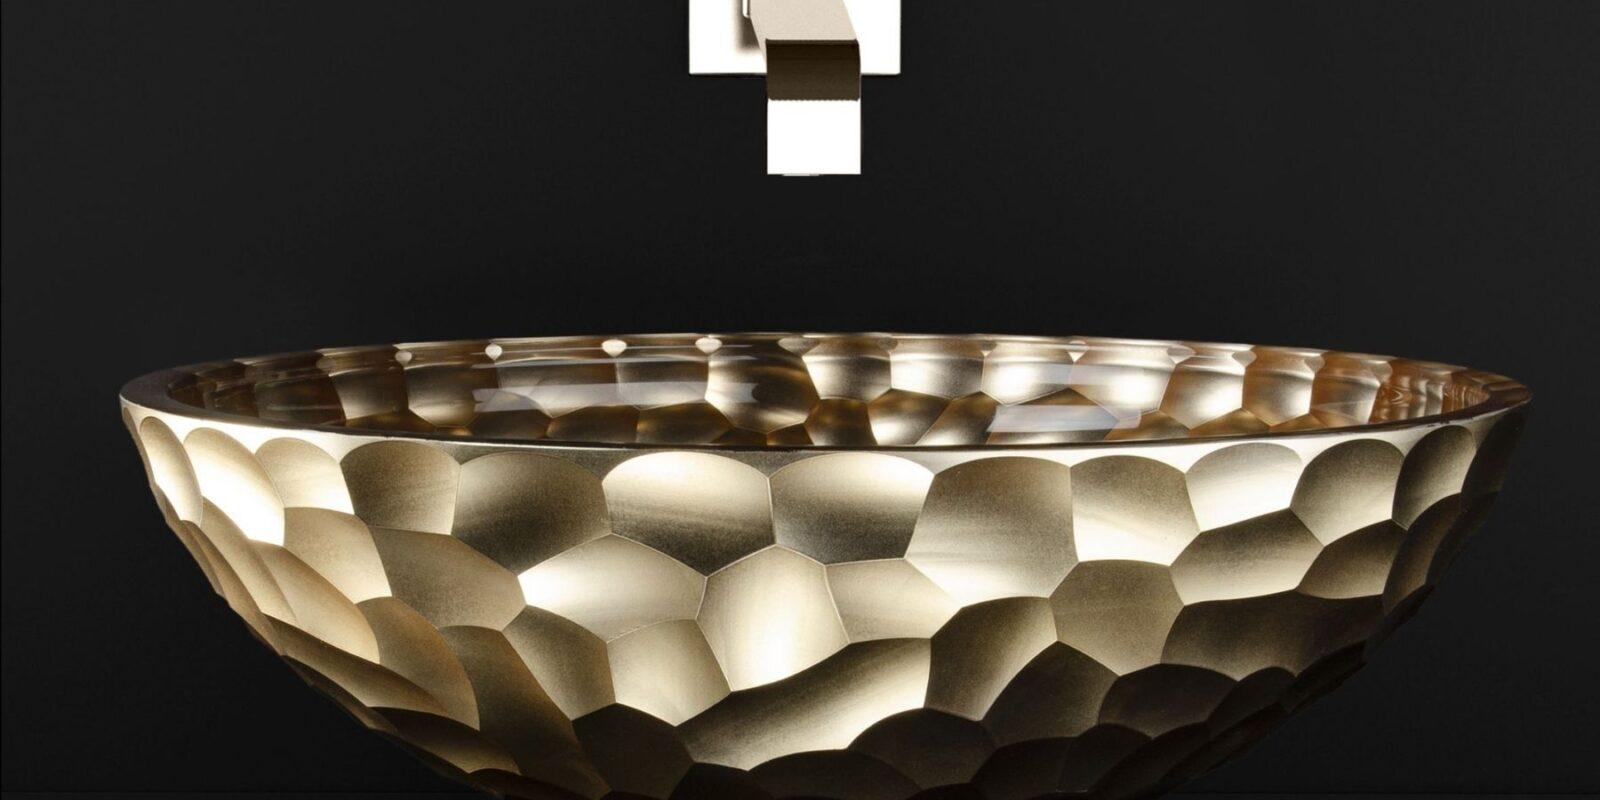 Glass Design presenta Orma